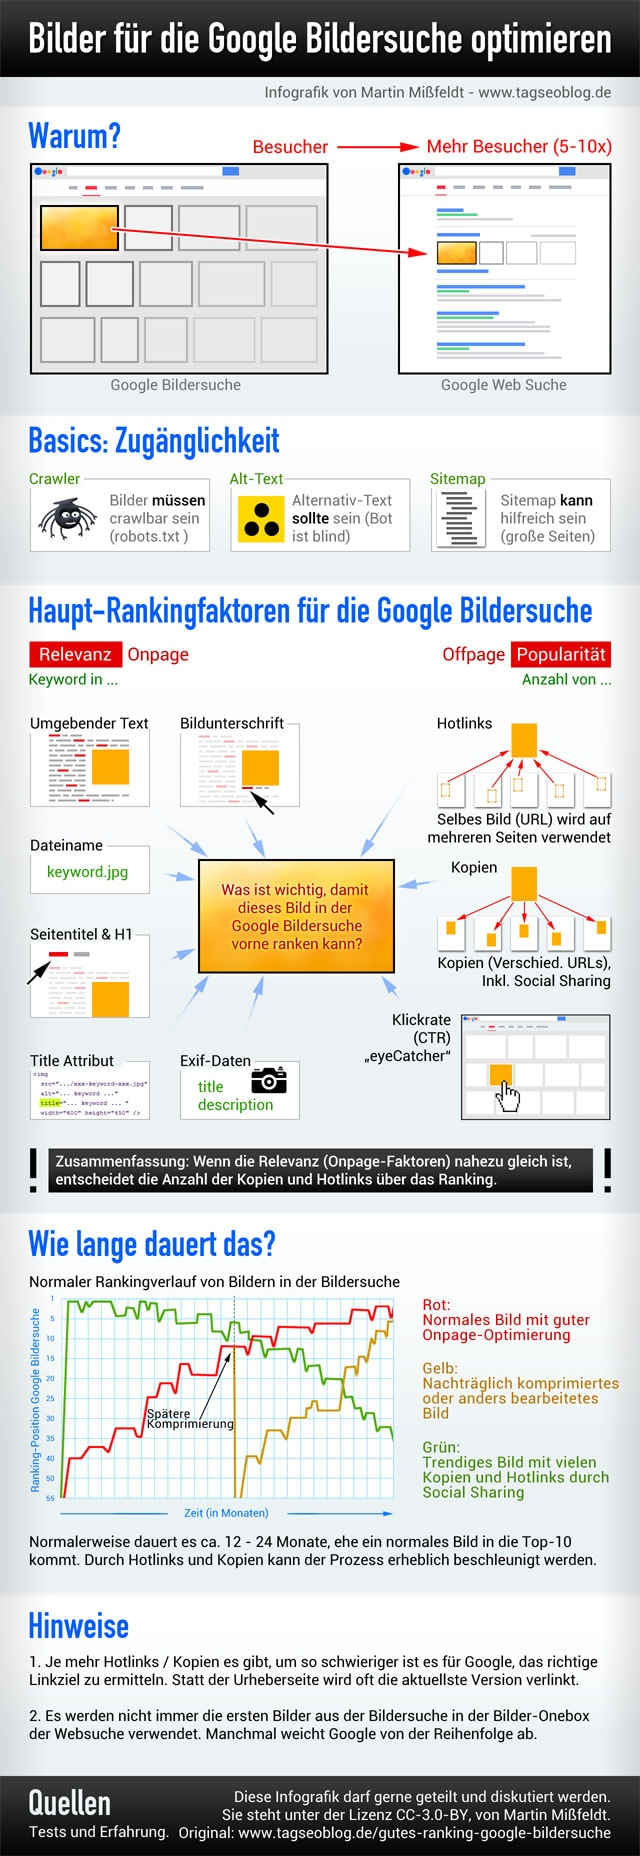 google-bildersuche-ranken-infografik-2014-me